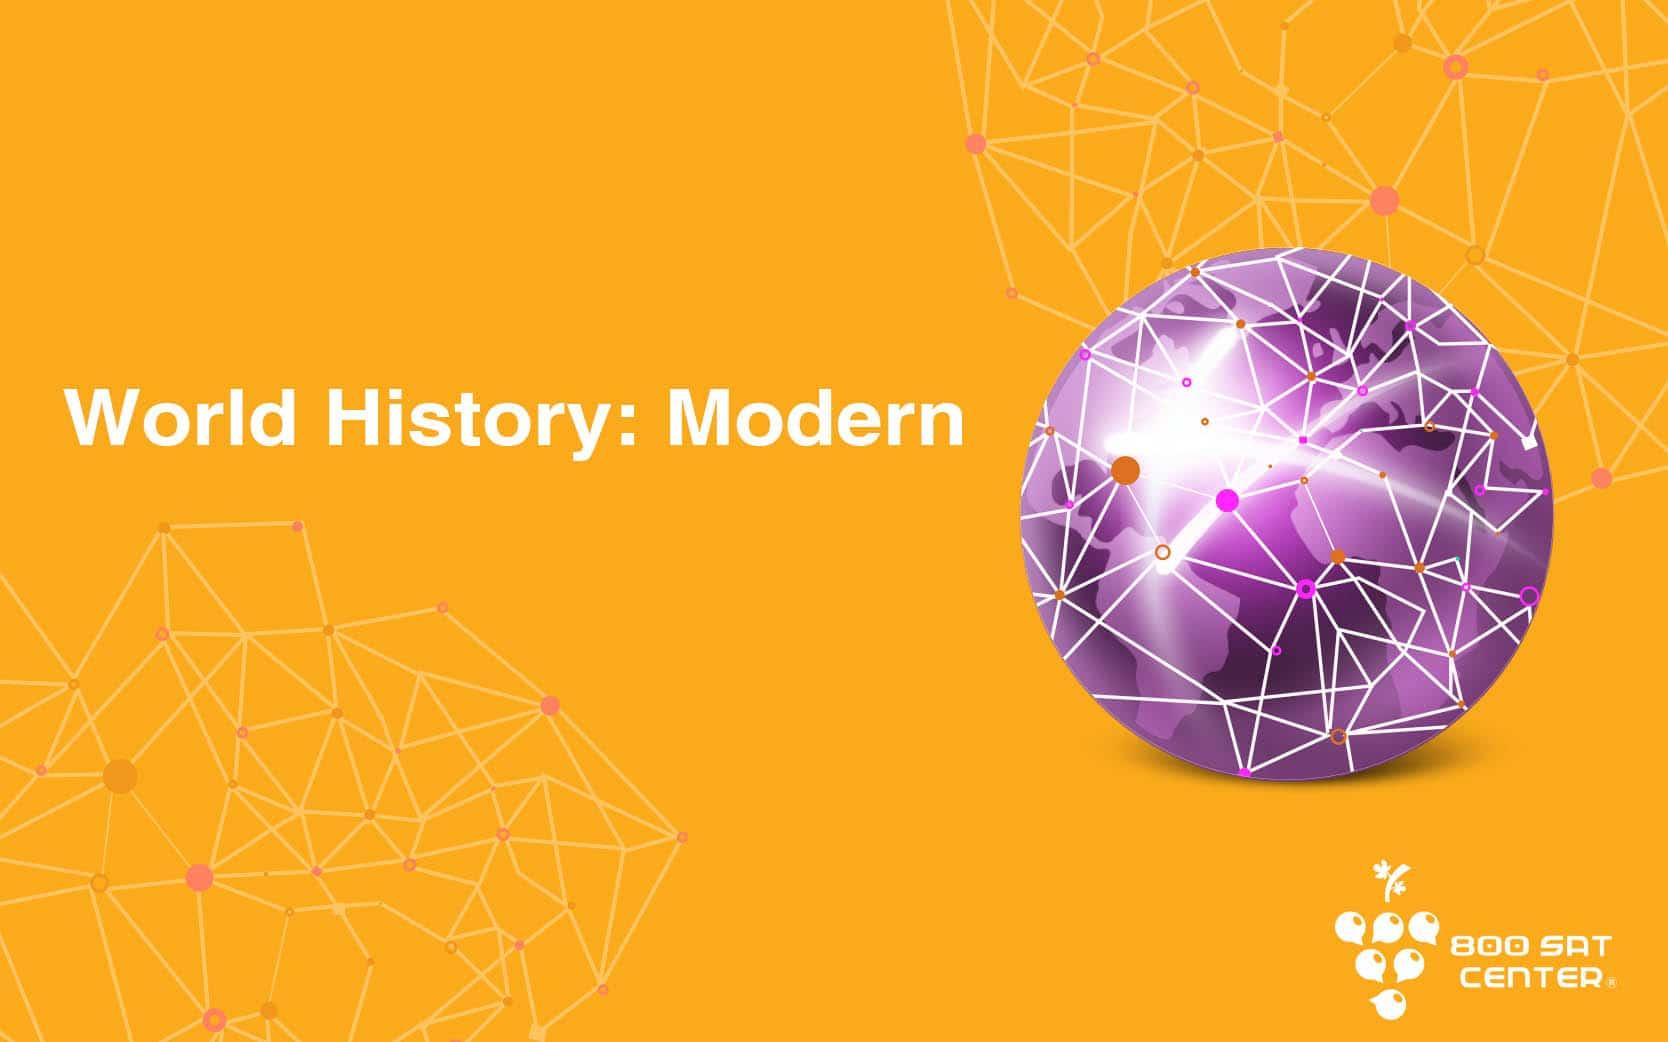 World History: Modern